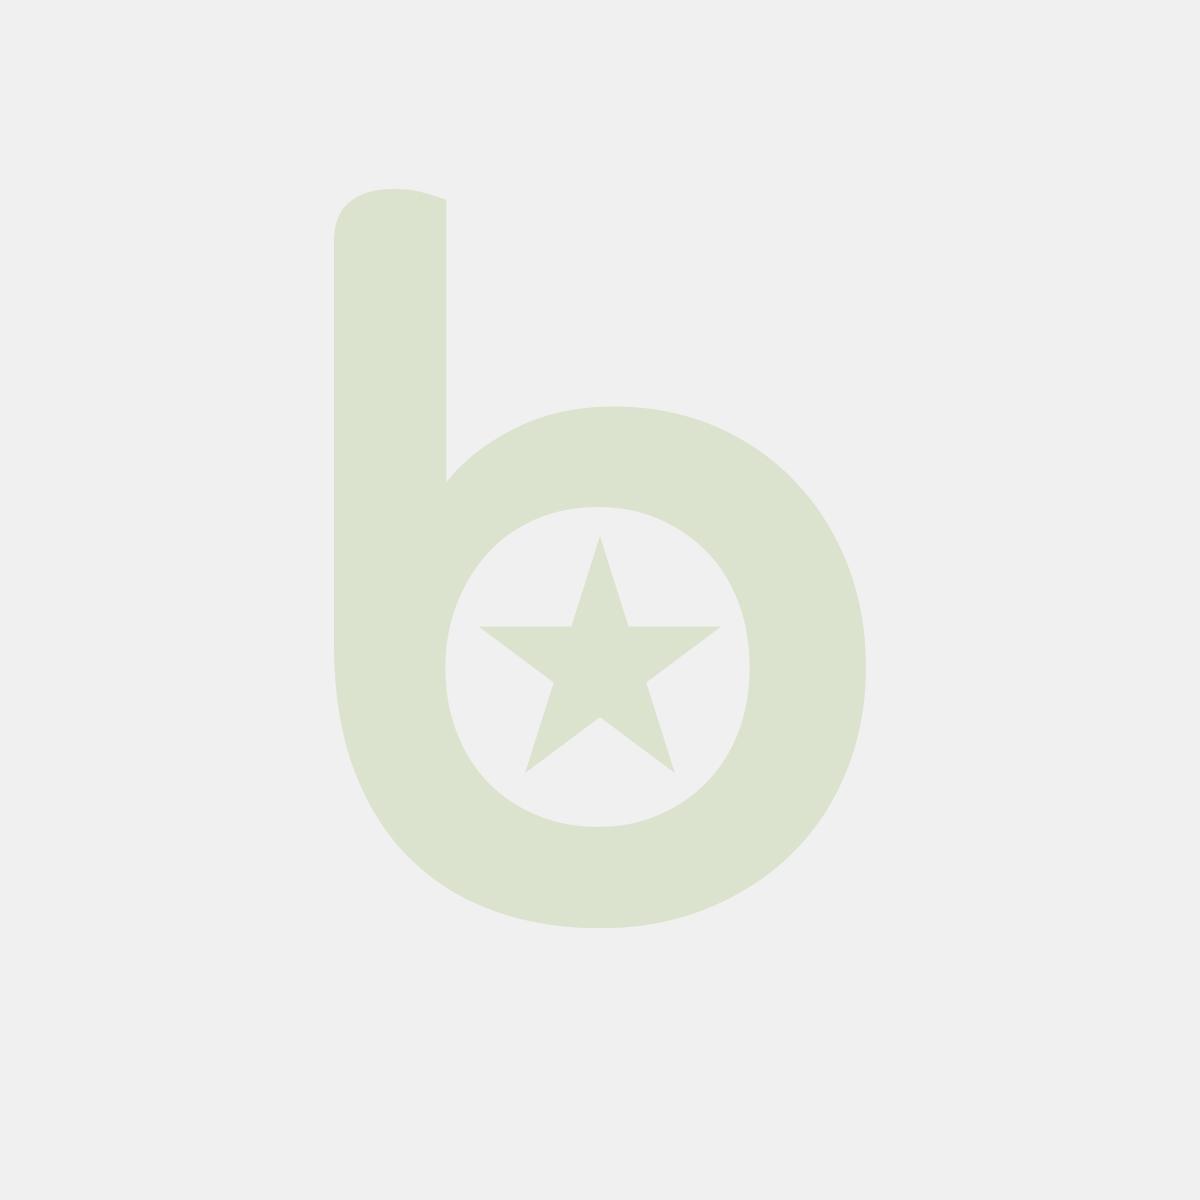 Ramka do tacek MANUPACK 227x178/COLT dwudzielna COLT